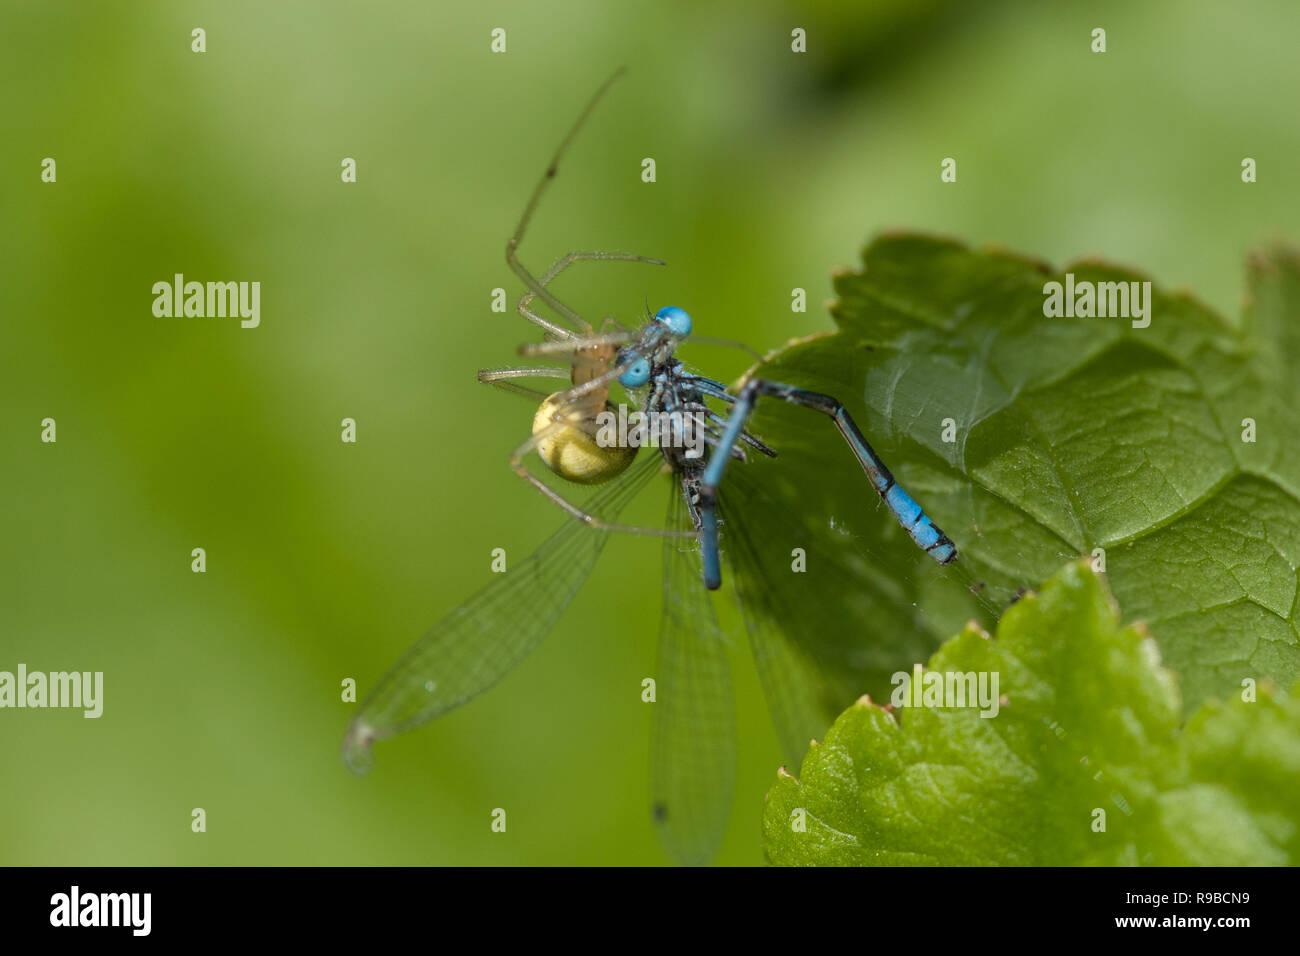 Comb-footed Spider - Enoplognatha ovata, eating damselflyUK - Stock Image